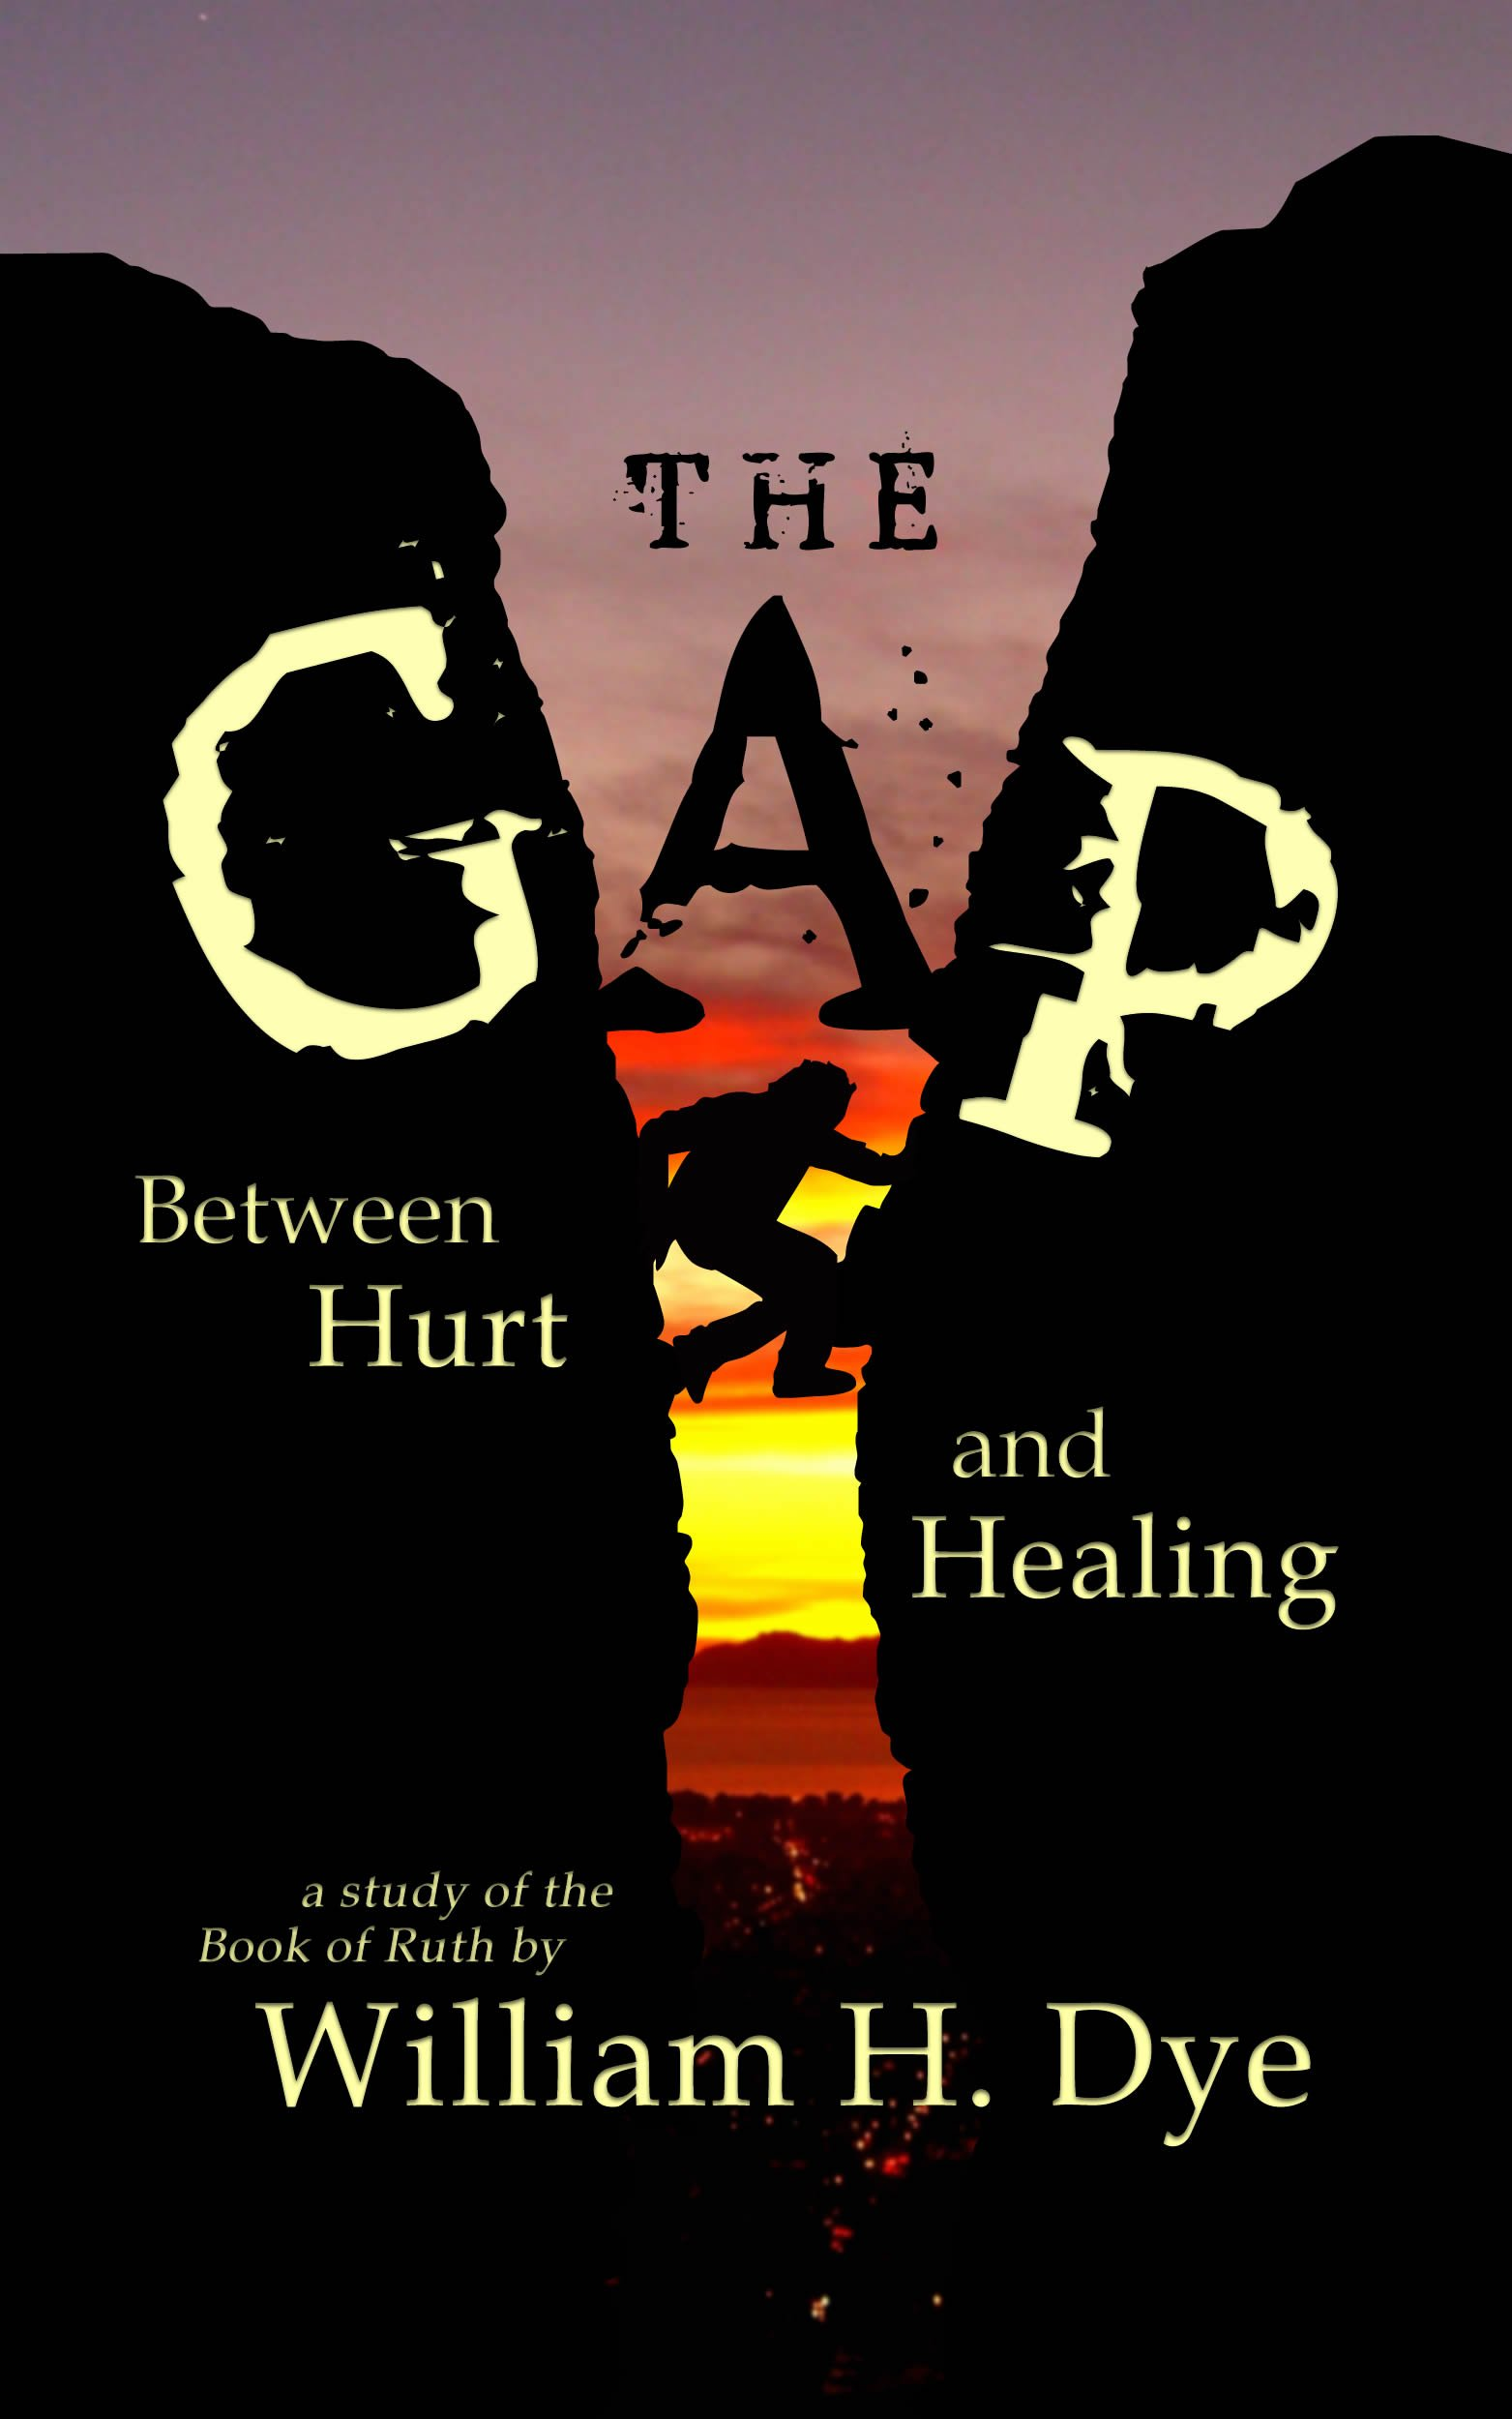 Read Online The Gap: Between Hurt and Healing PDF